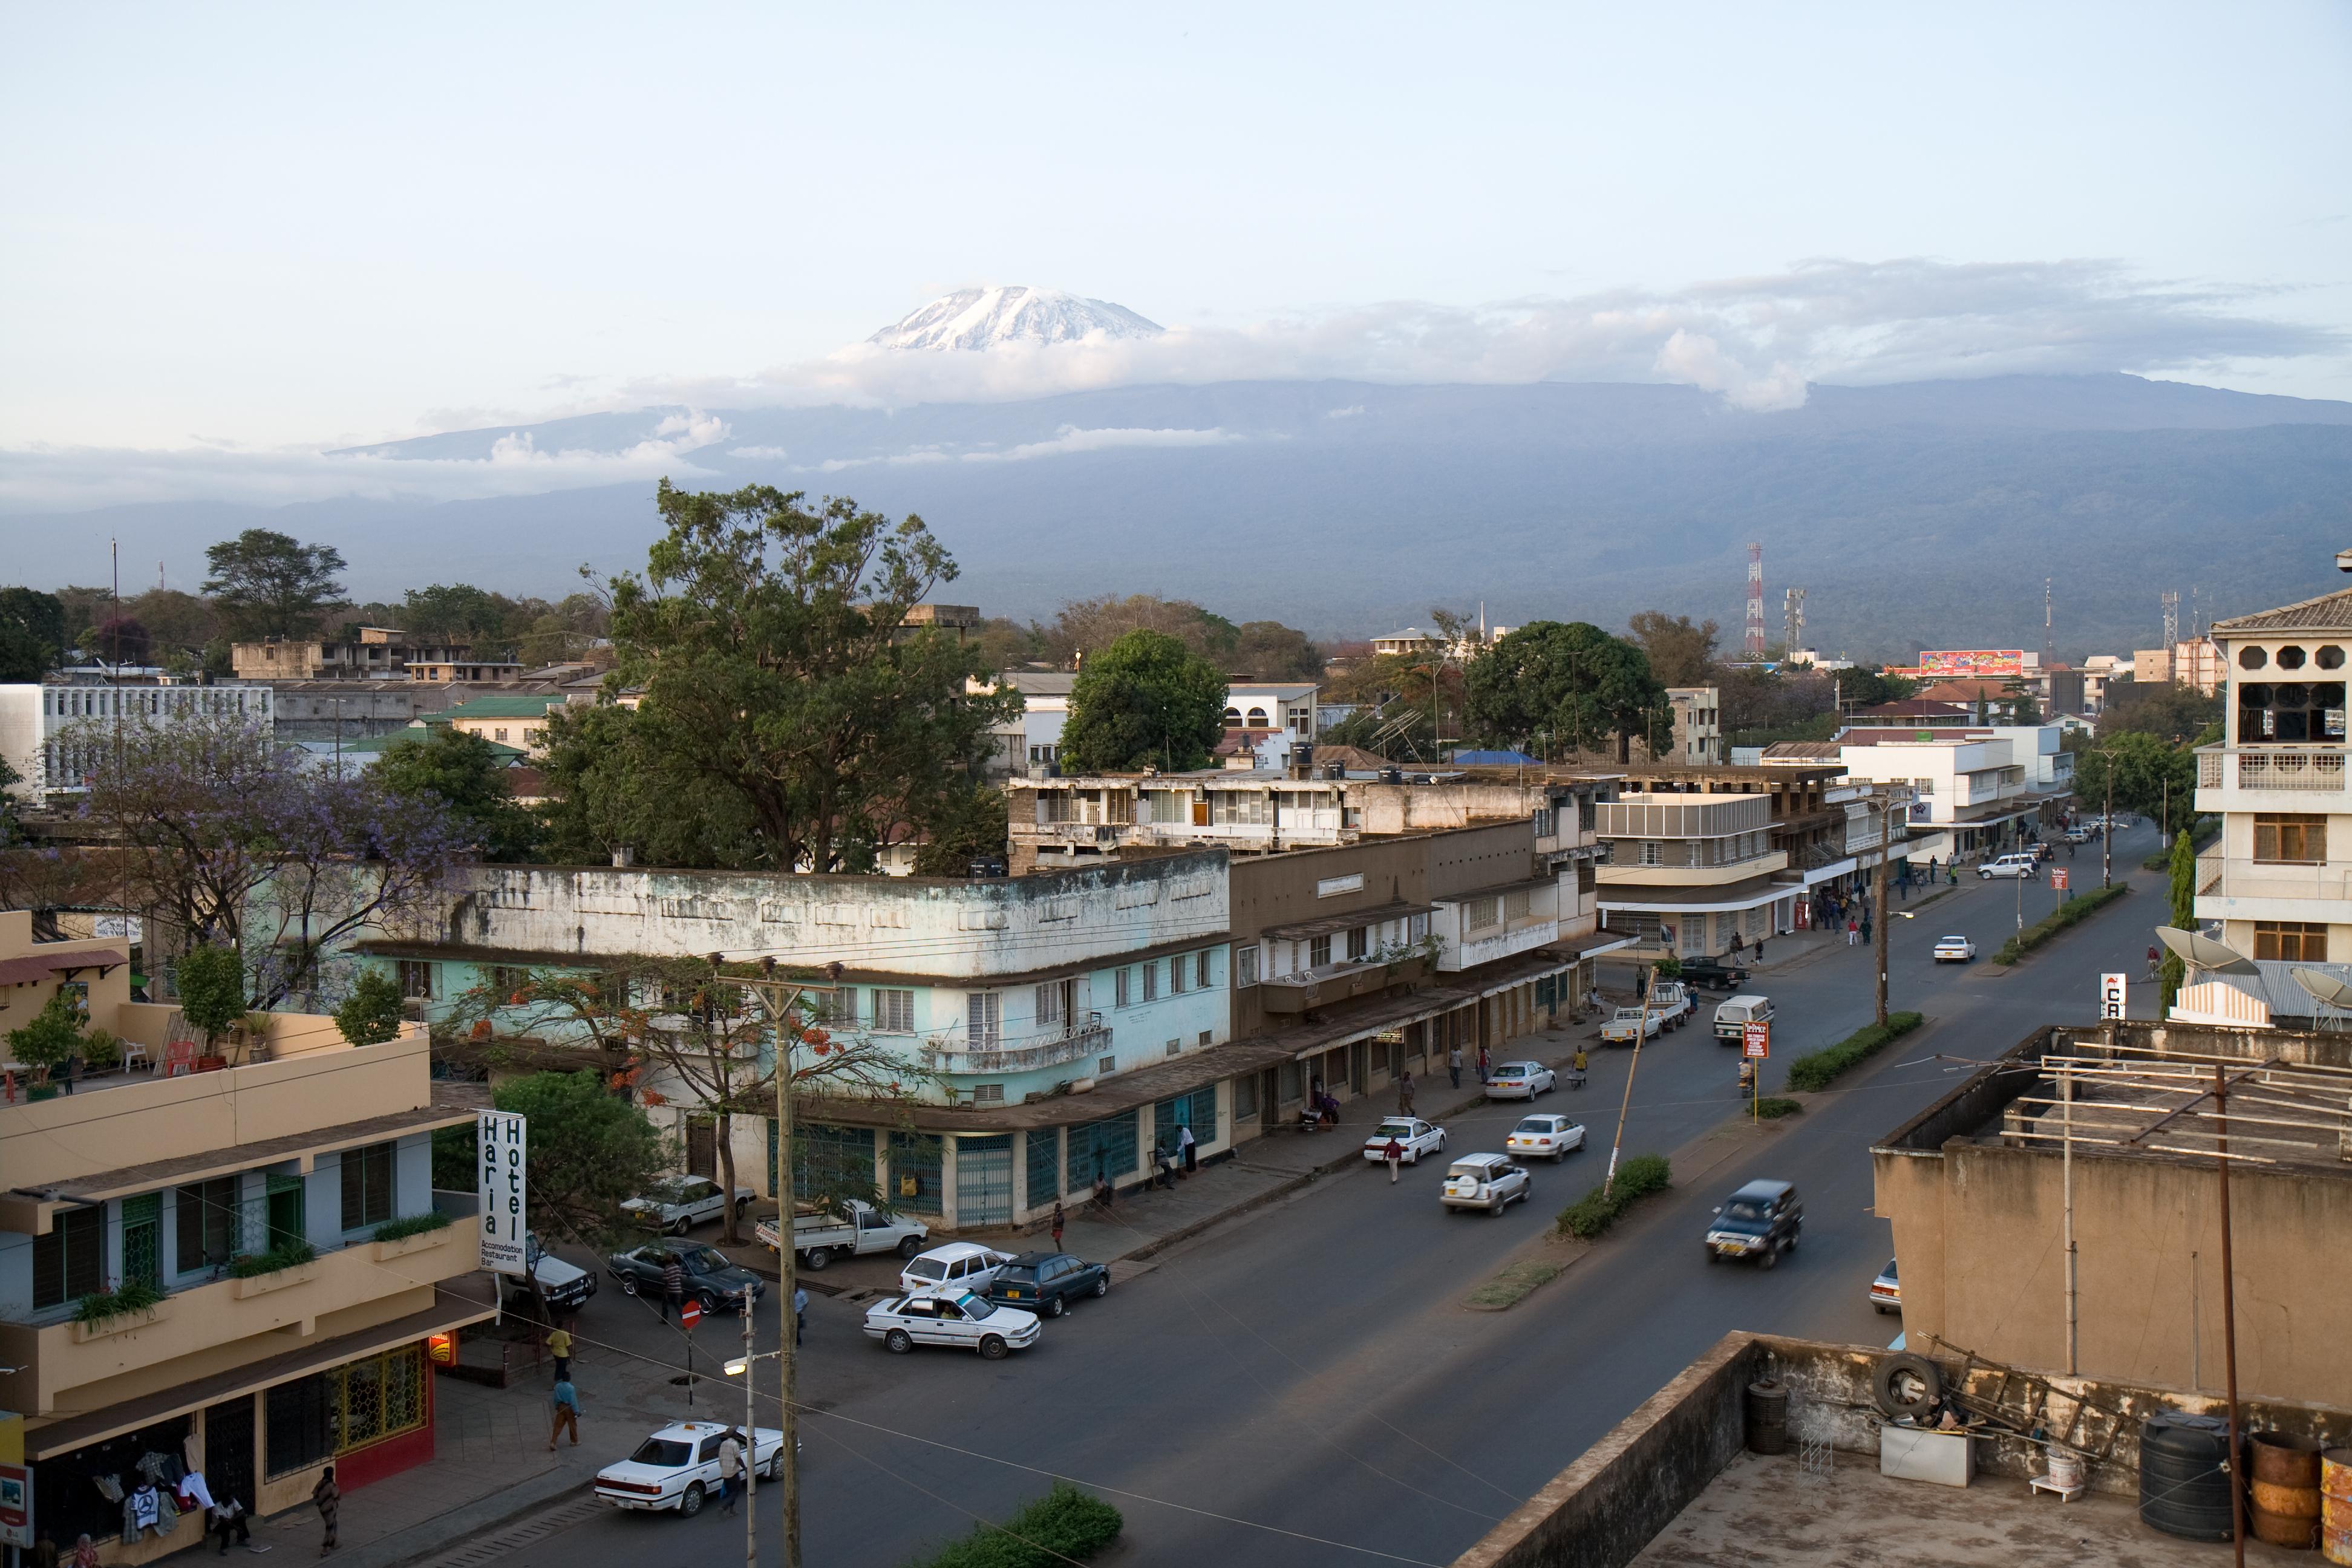 Moshi Tanzania  city images : Description Kilimanjaro Moshi